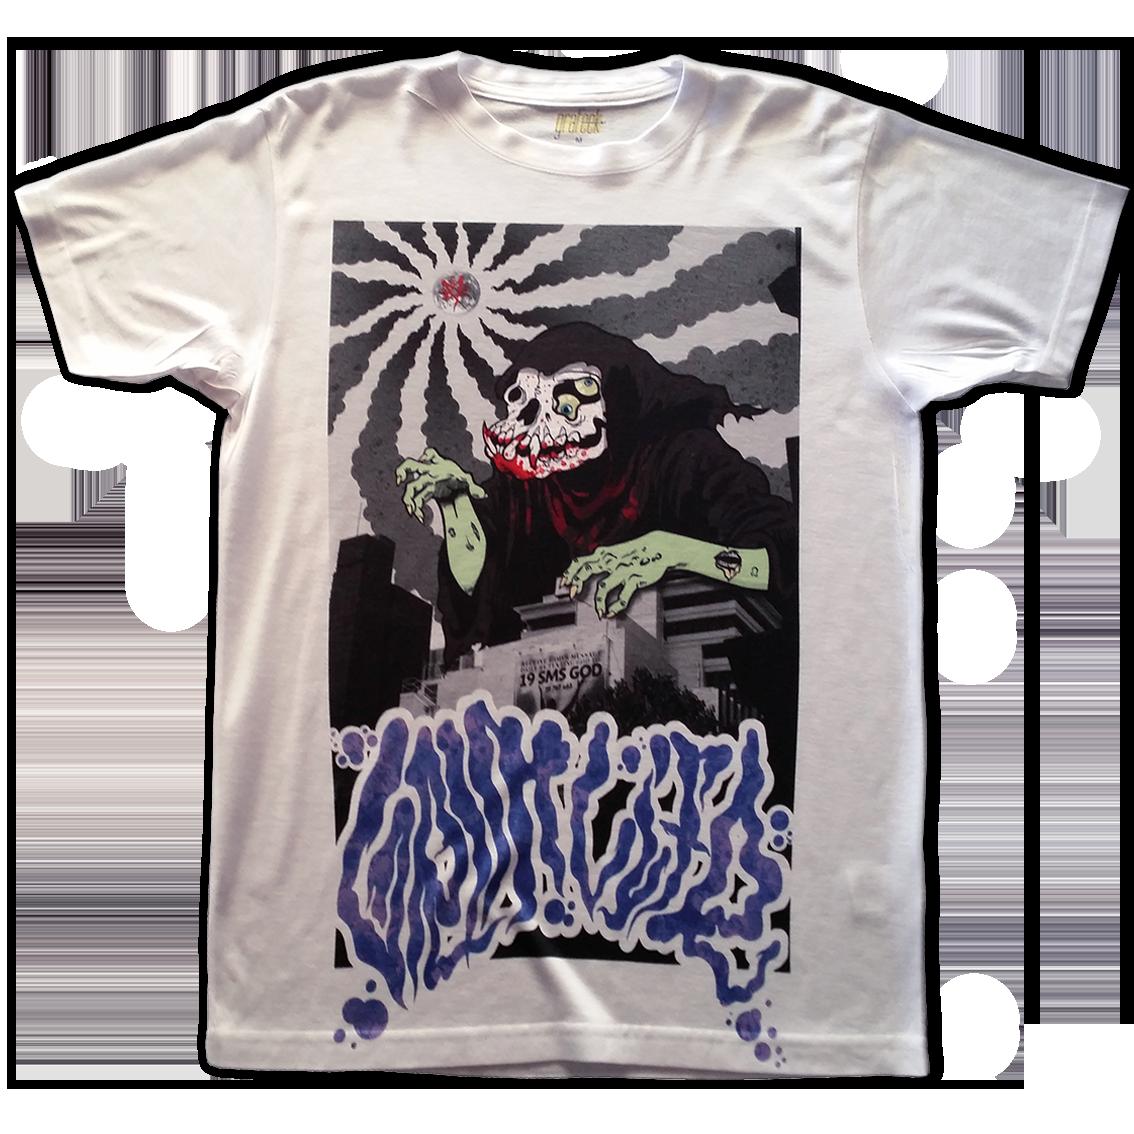 A3 print on Vapor basic t-shirt